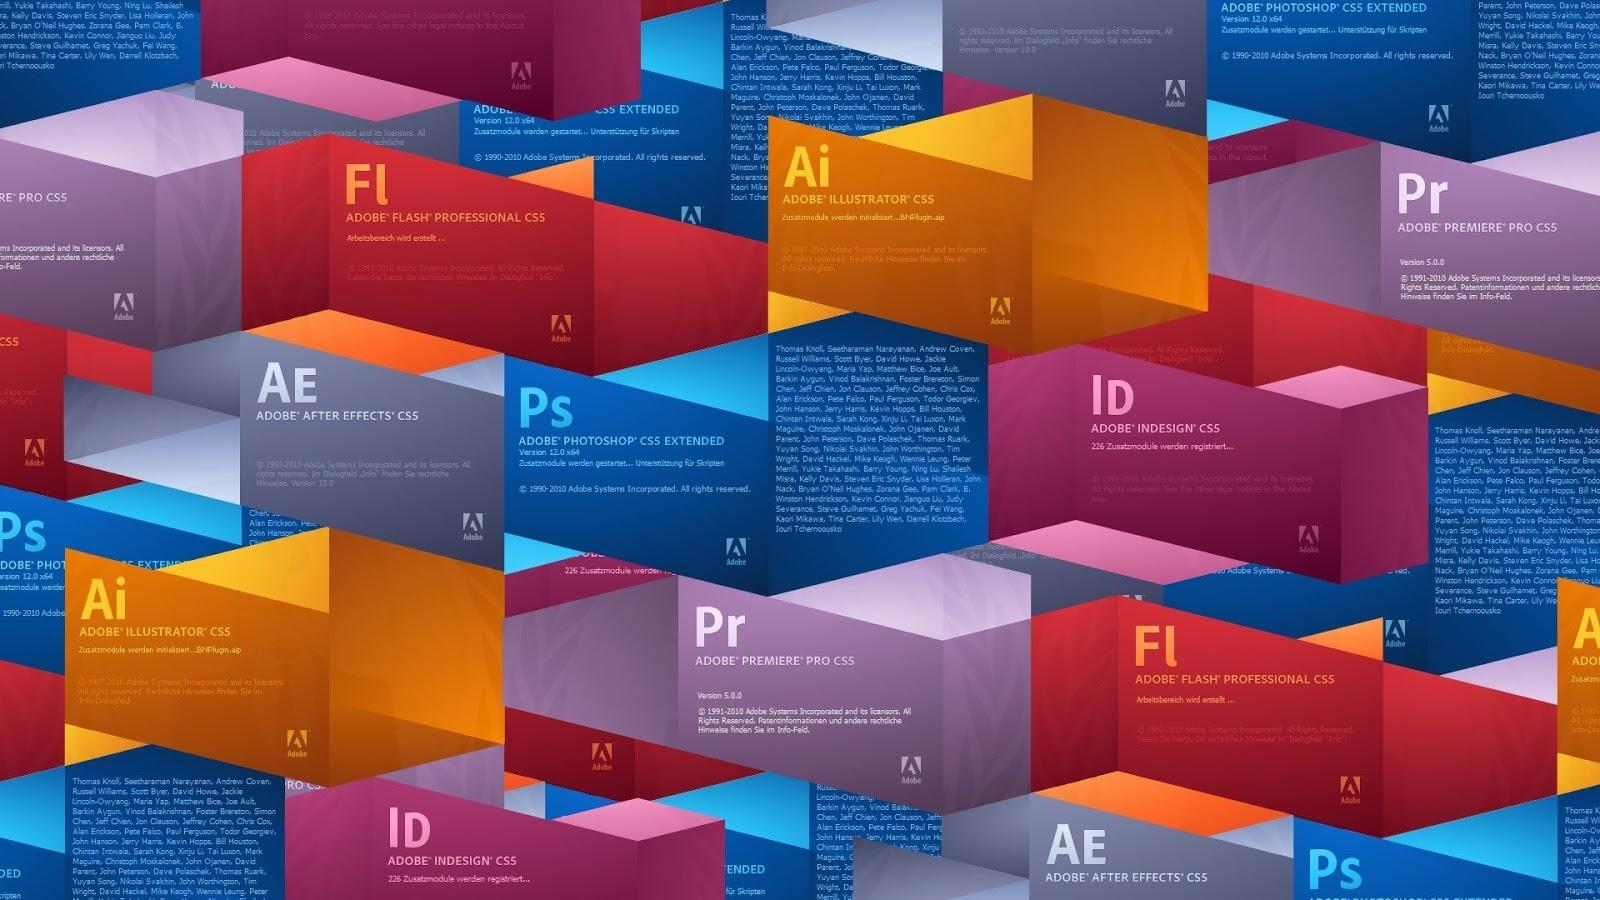 Cara Menambah Masa Trial Adobe - Mannesco